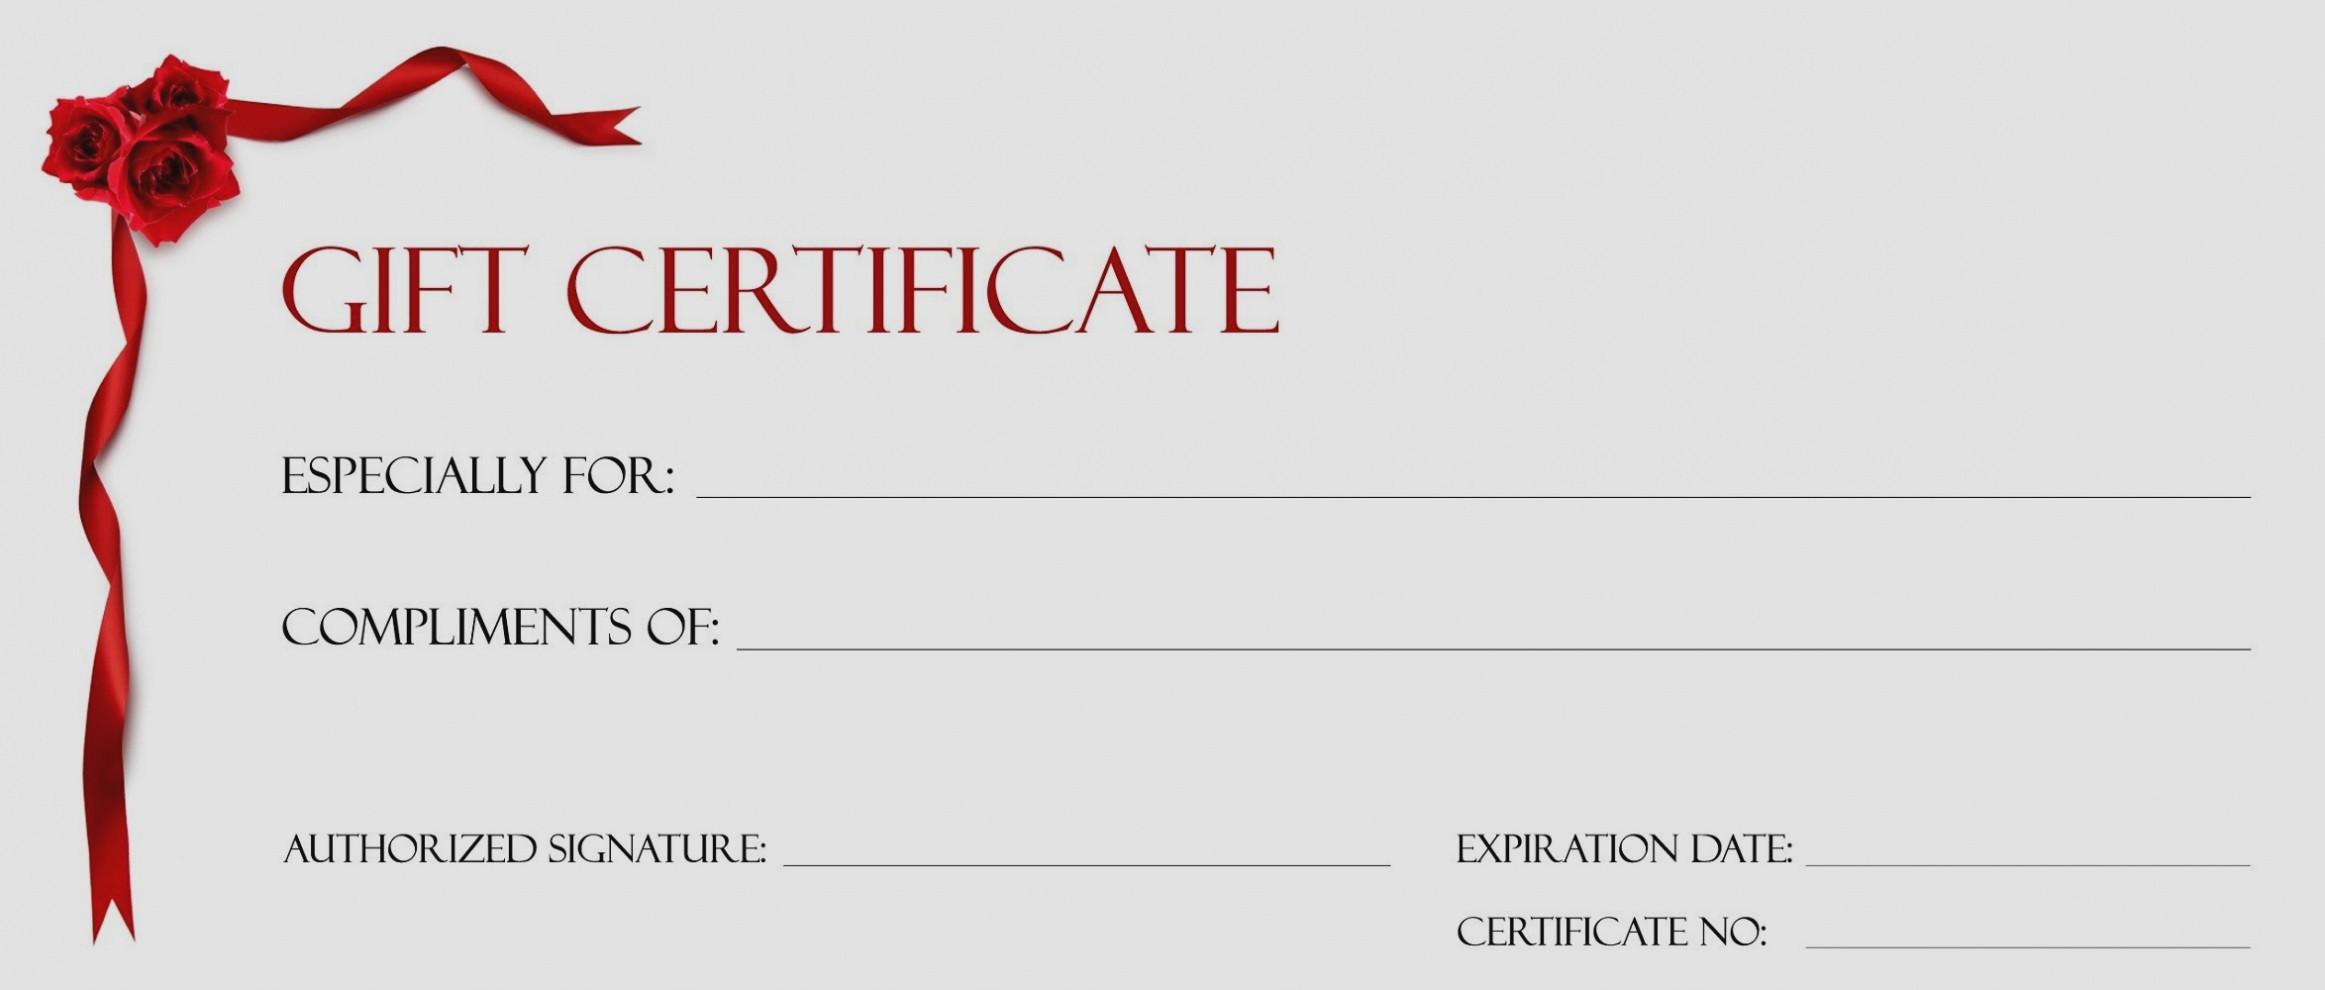 Congratulations Certificate Template Microsoft Word Beautiful Gift